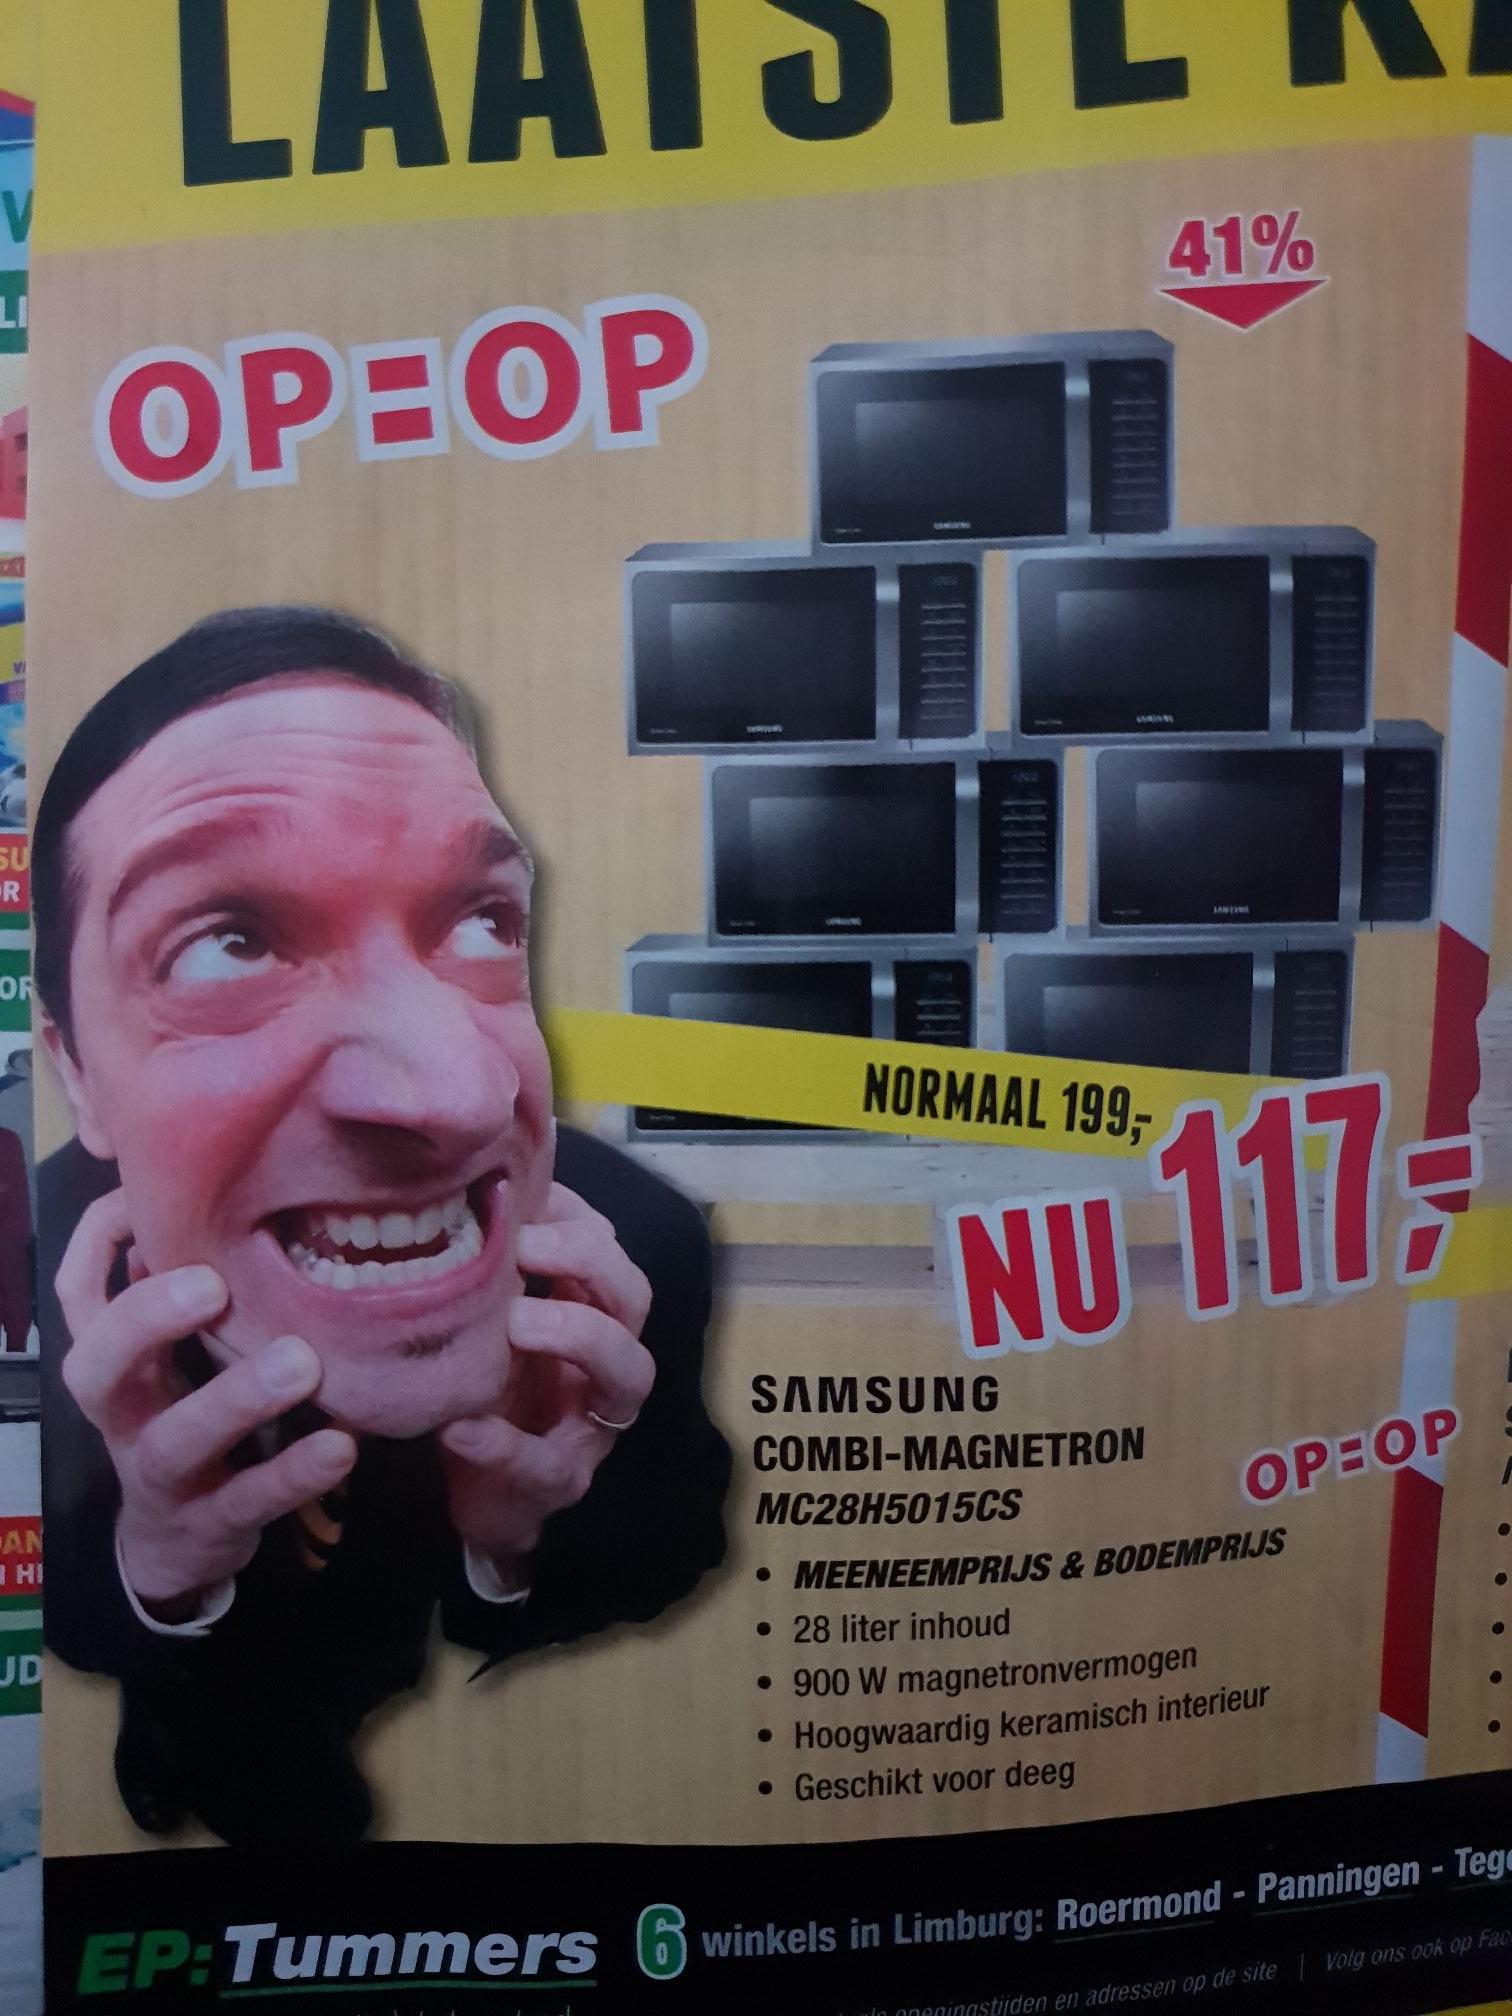 (Lokaal) Samsung COMBI-MAGNETRON MC28H5015CS @EP:Tummers